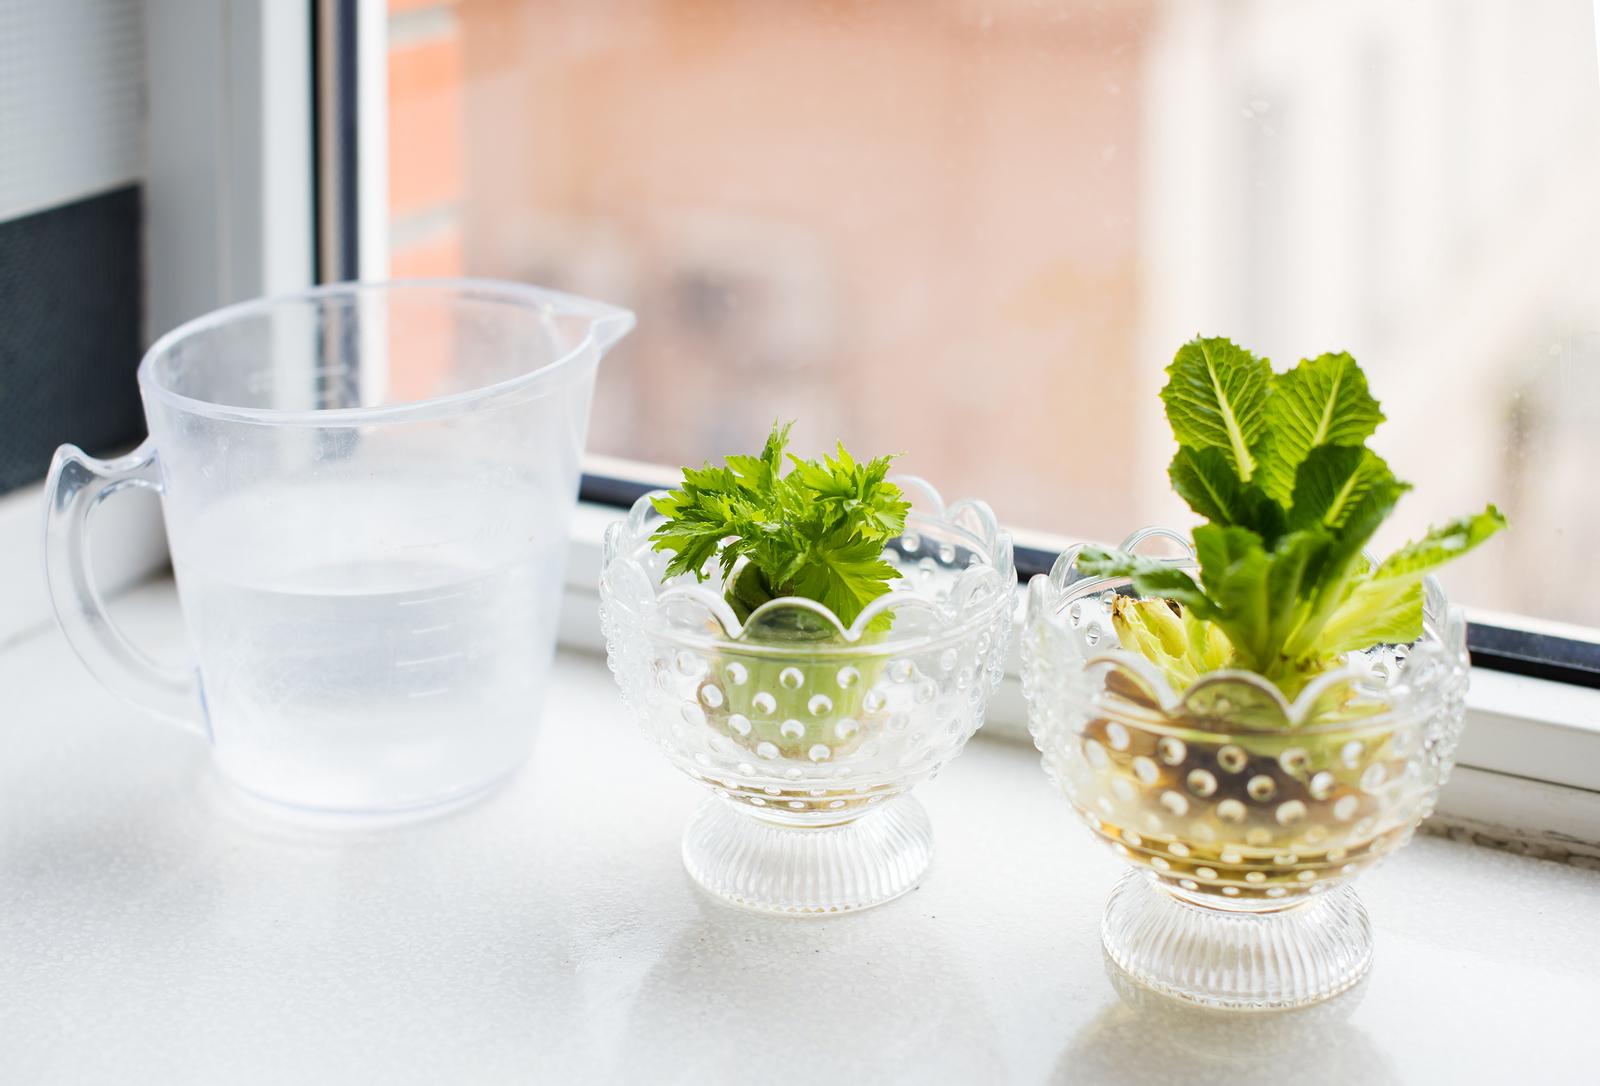 stronk van sla en bleekselderij groeien in glas water